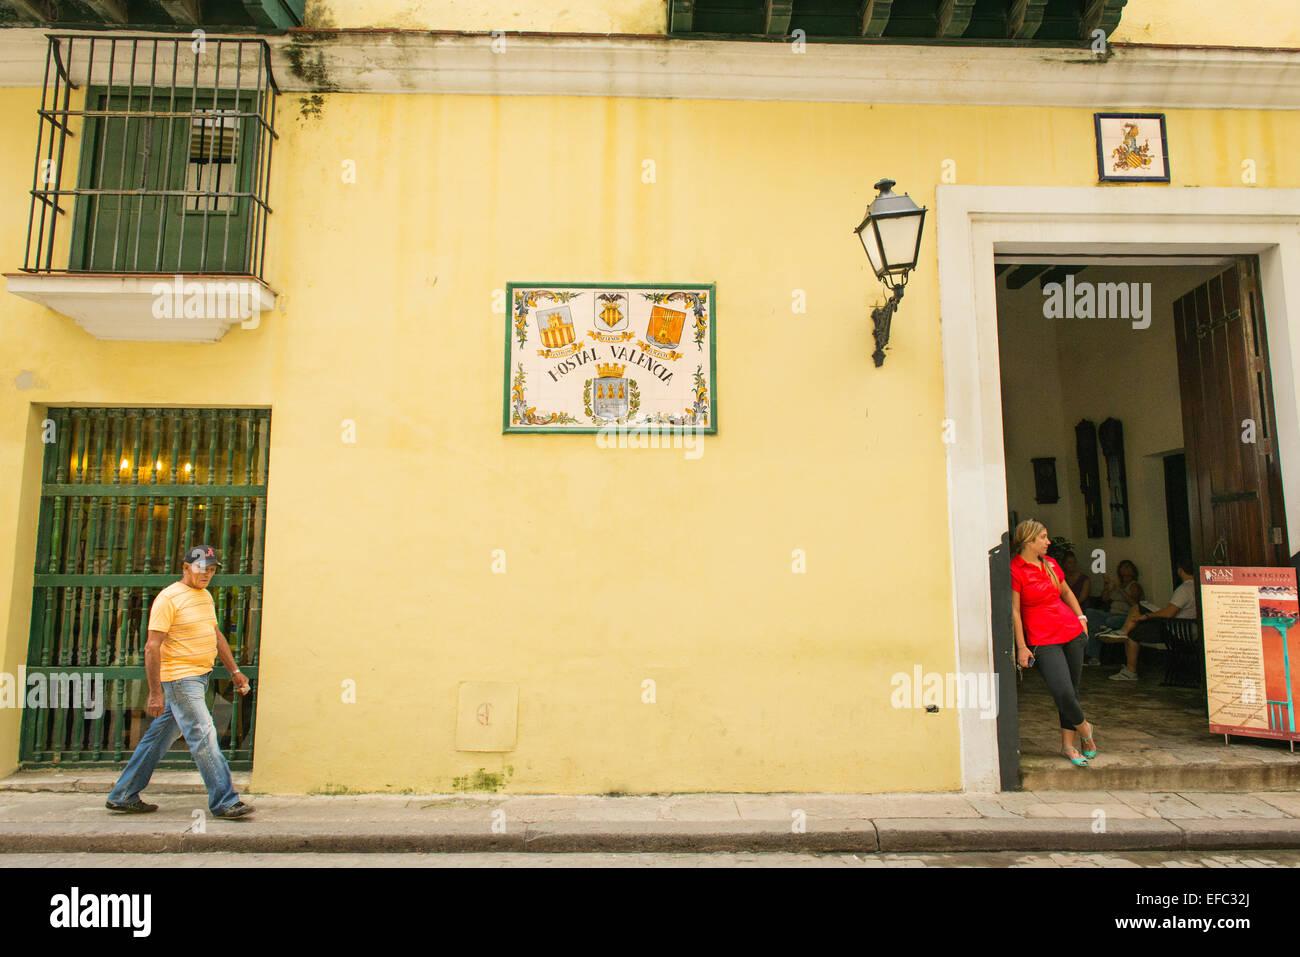 Kuba Altstadt Havanna La Habana Vieja Hostal Valencia-Boutique-Hotel war 18. Jahrhundert Haus 1. Stock Casa del Stockbild